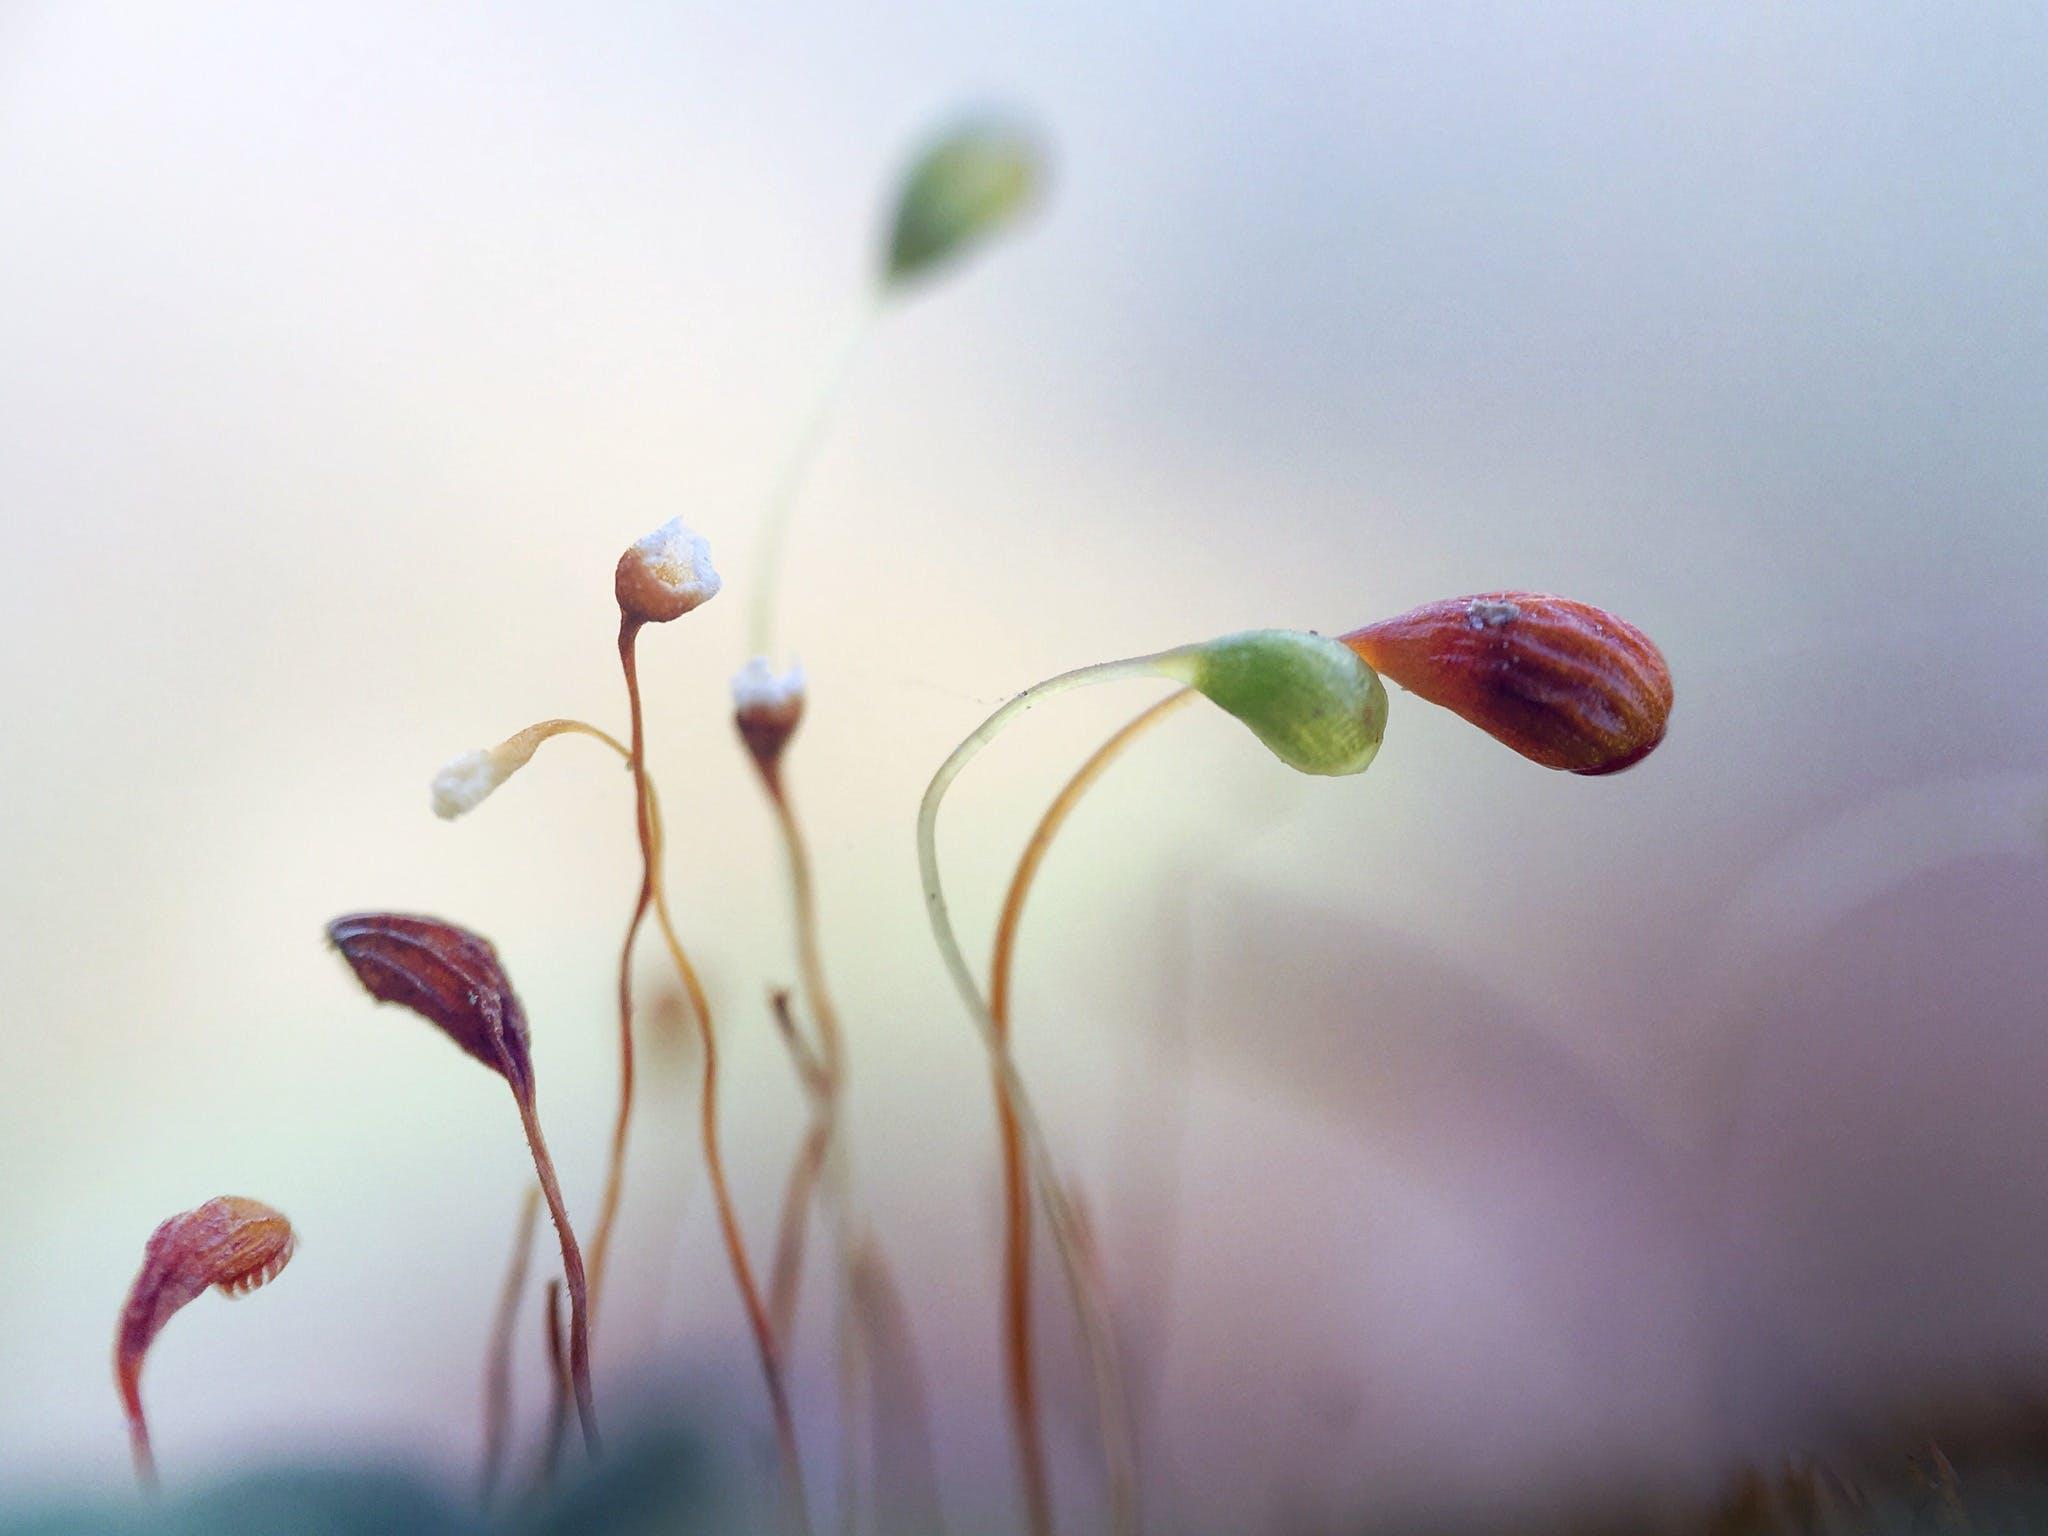 Kostenloses Stock Foto zu #macro #moss #natur # makrofotografie #details